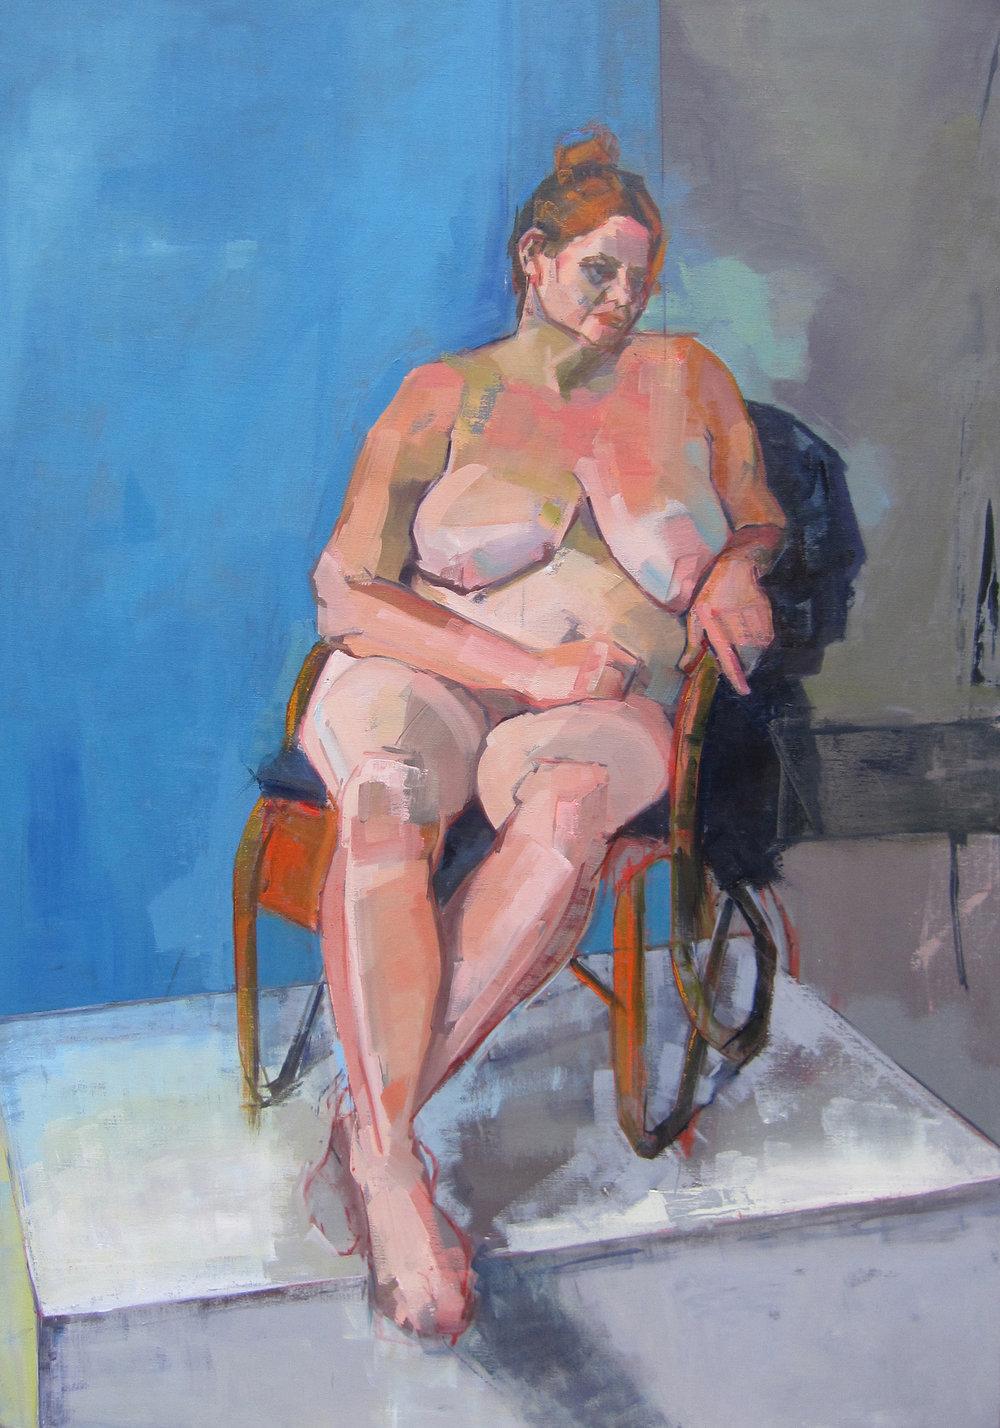 Eve Pettitt, Seated Nude, Oil on canvas, 100 x 70 x 4 cm,  http://evepettitt.co.uk